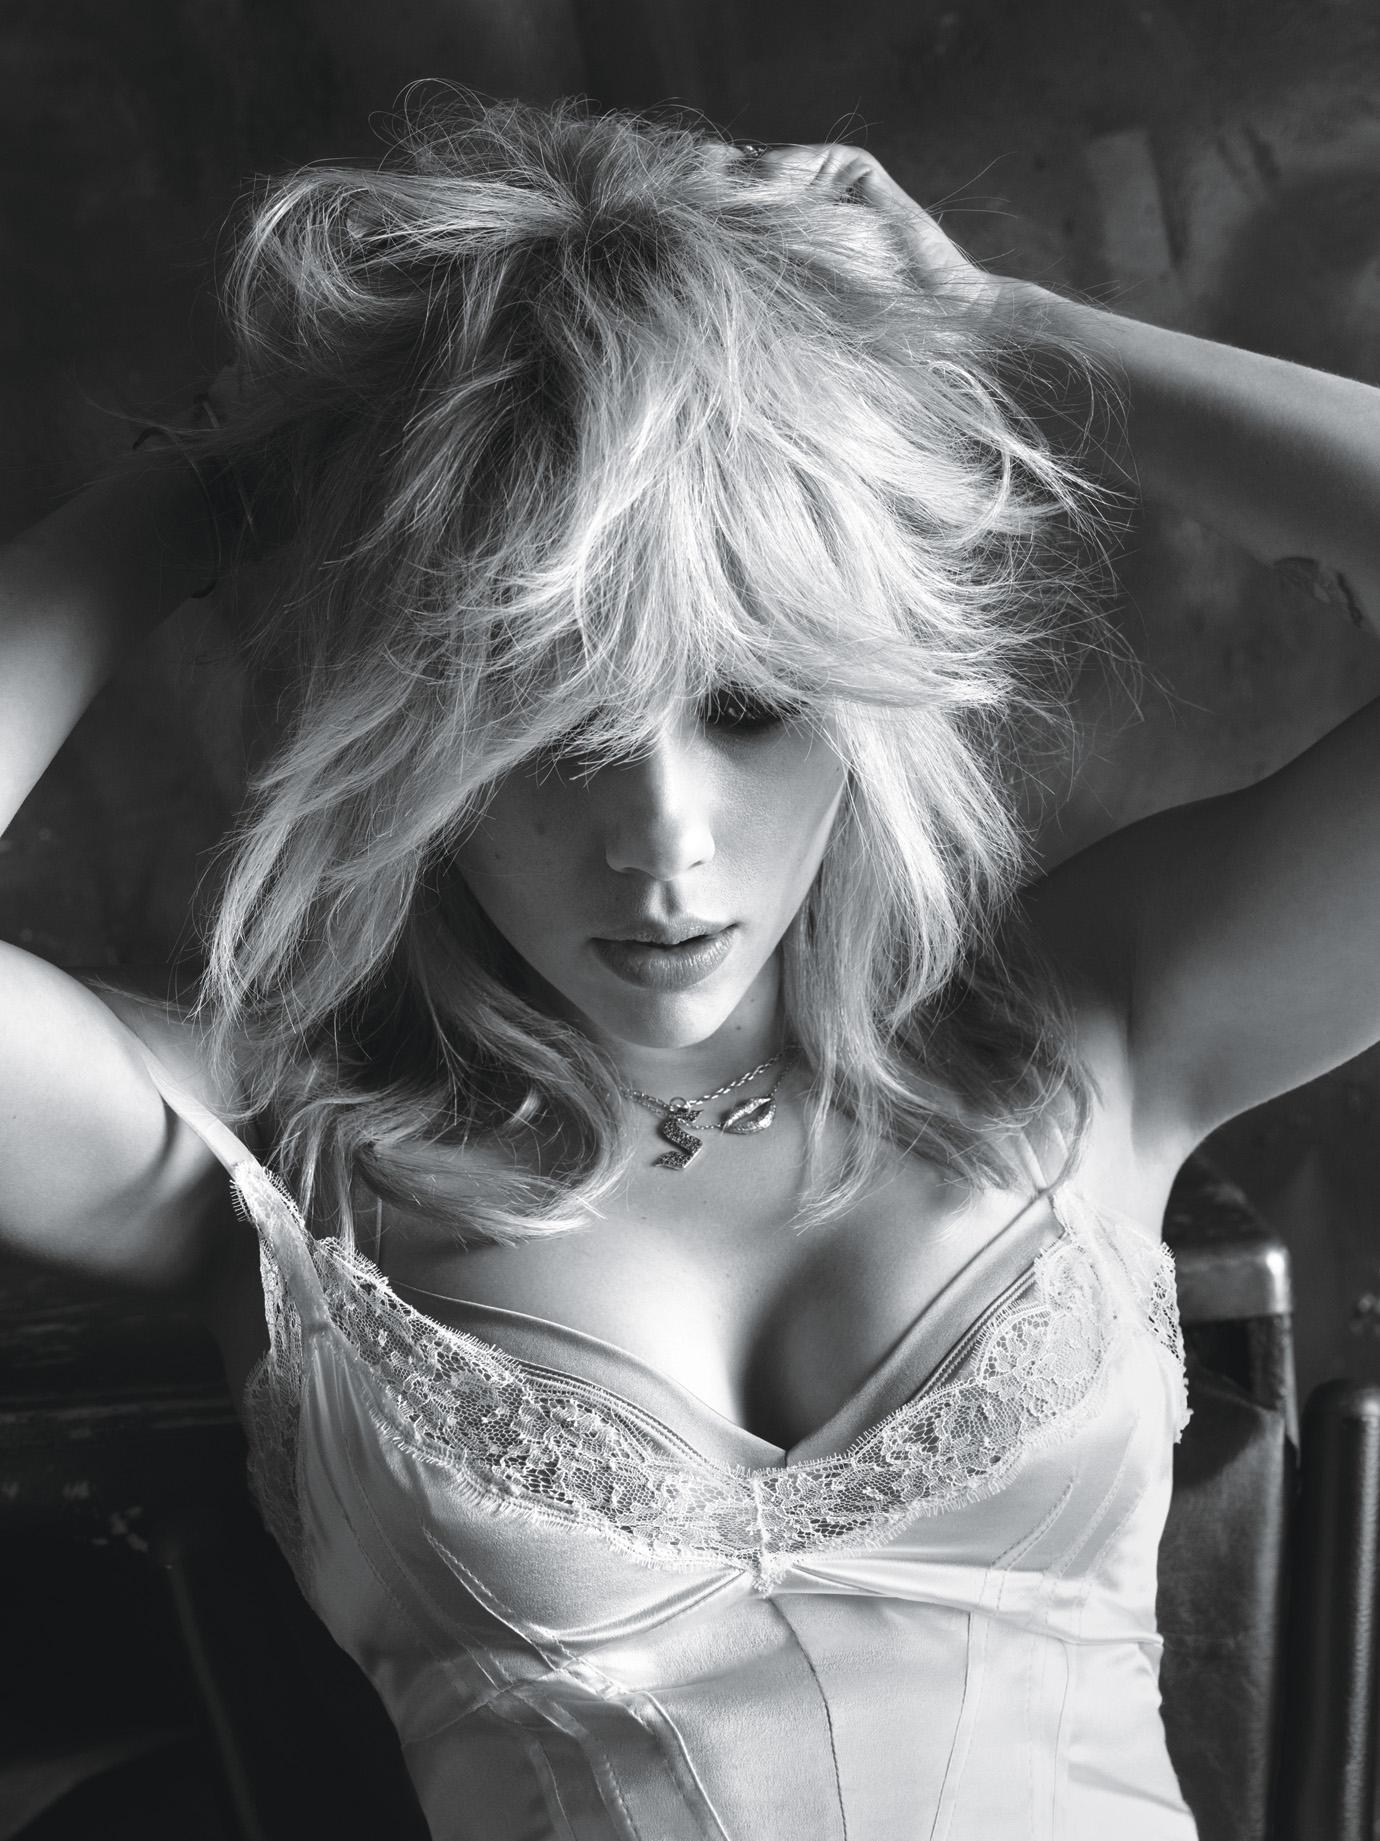 Scarlett Johansson Hot Photos 1